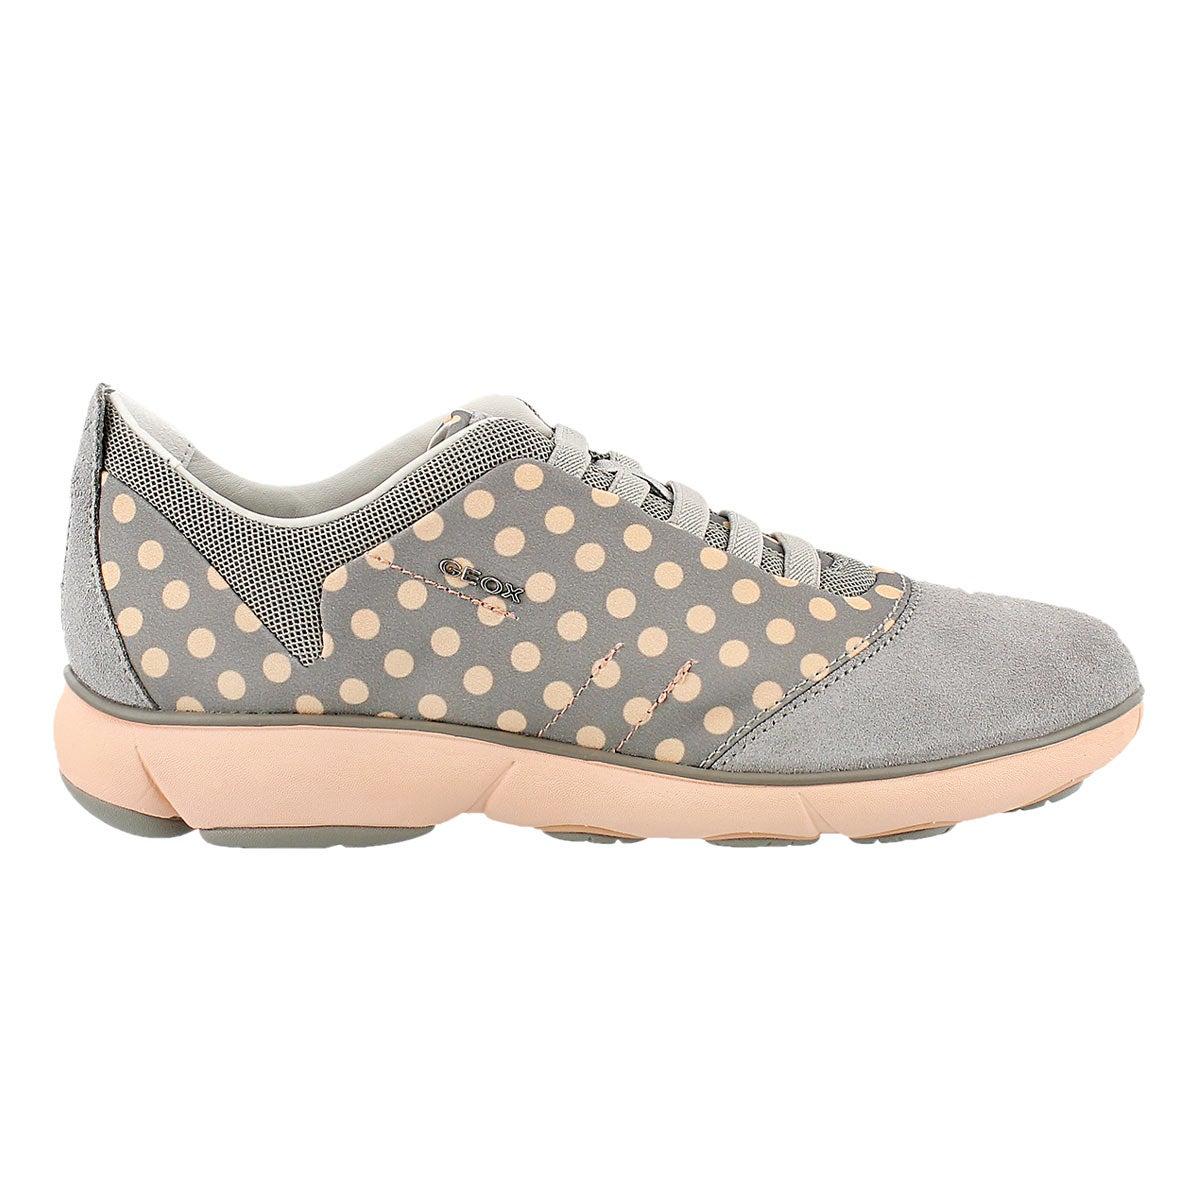 Lds Nebula lt gry/peach running shoe